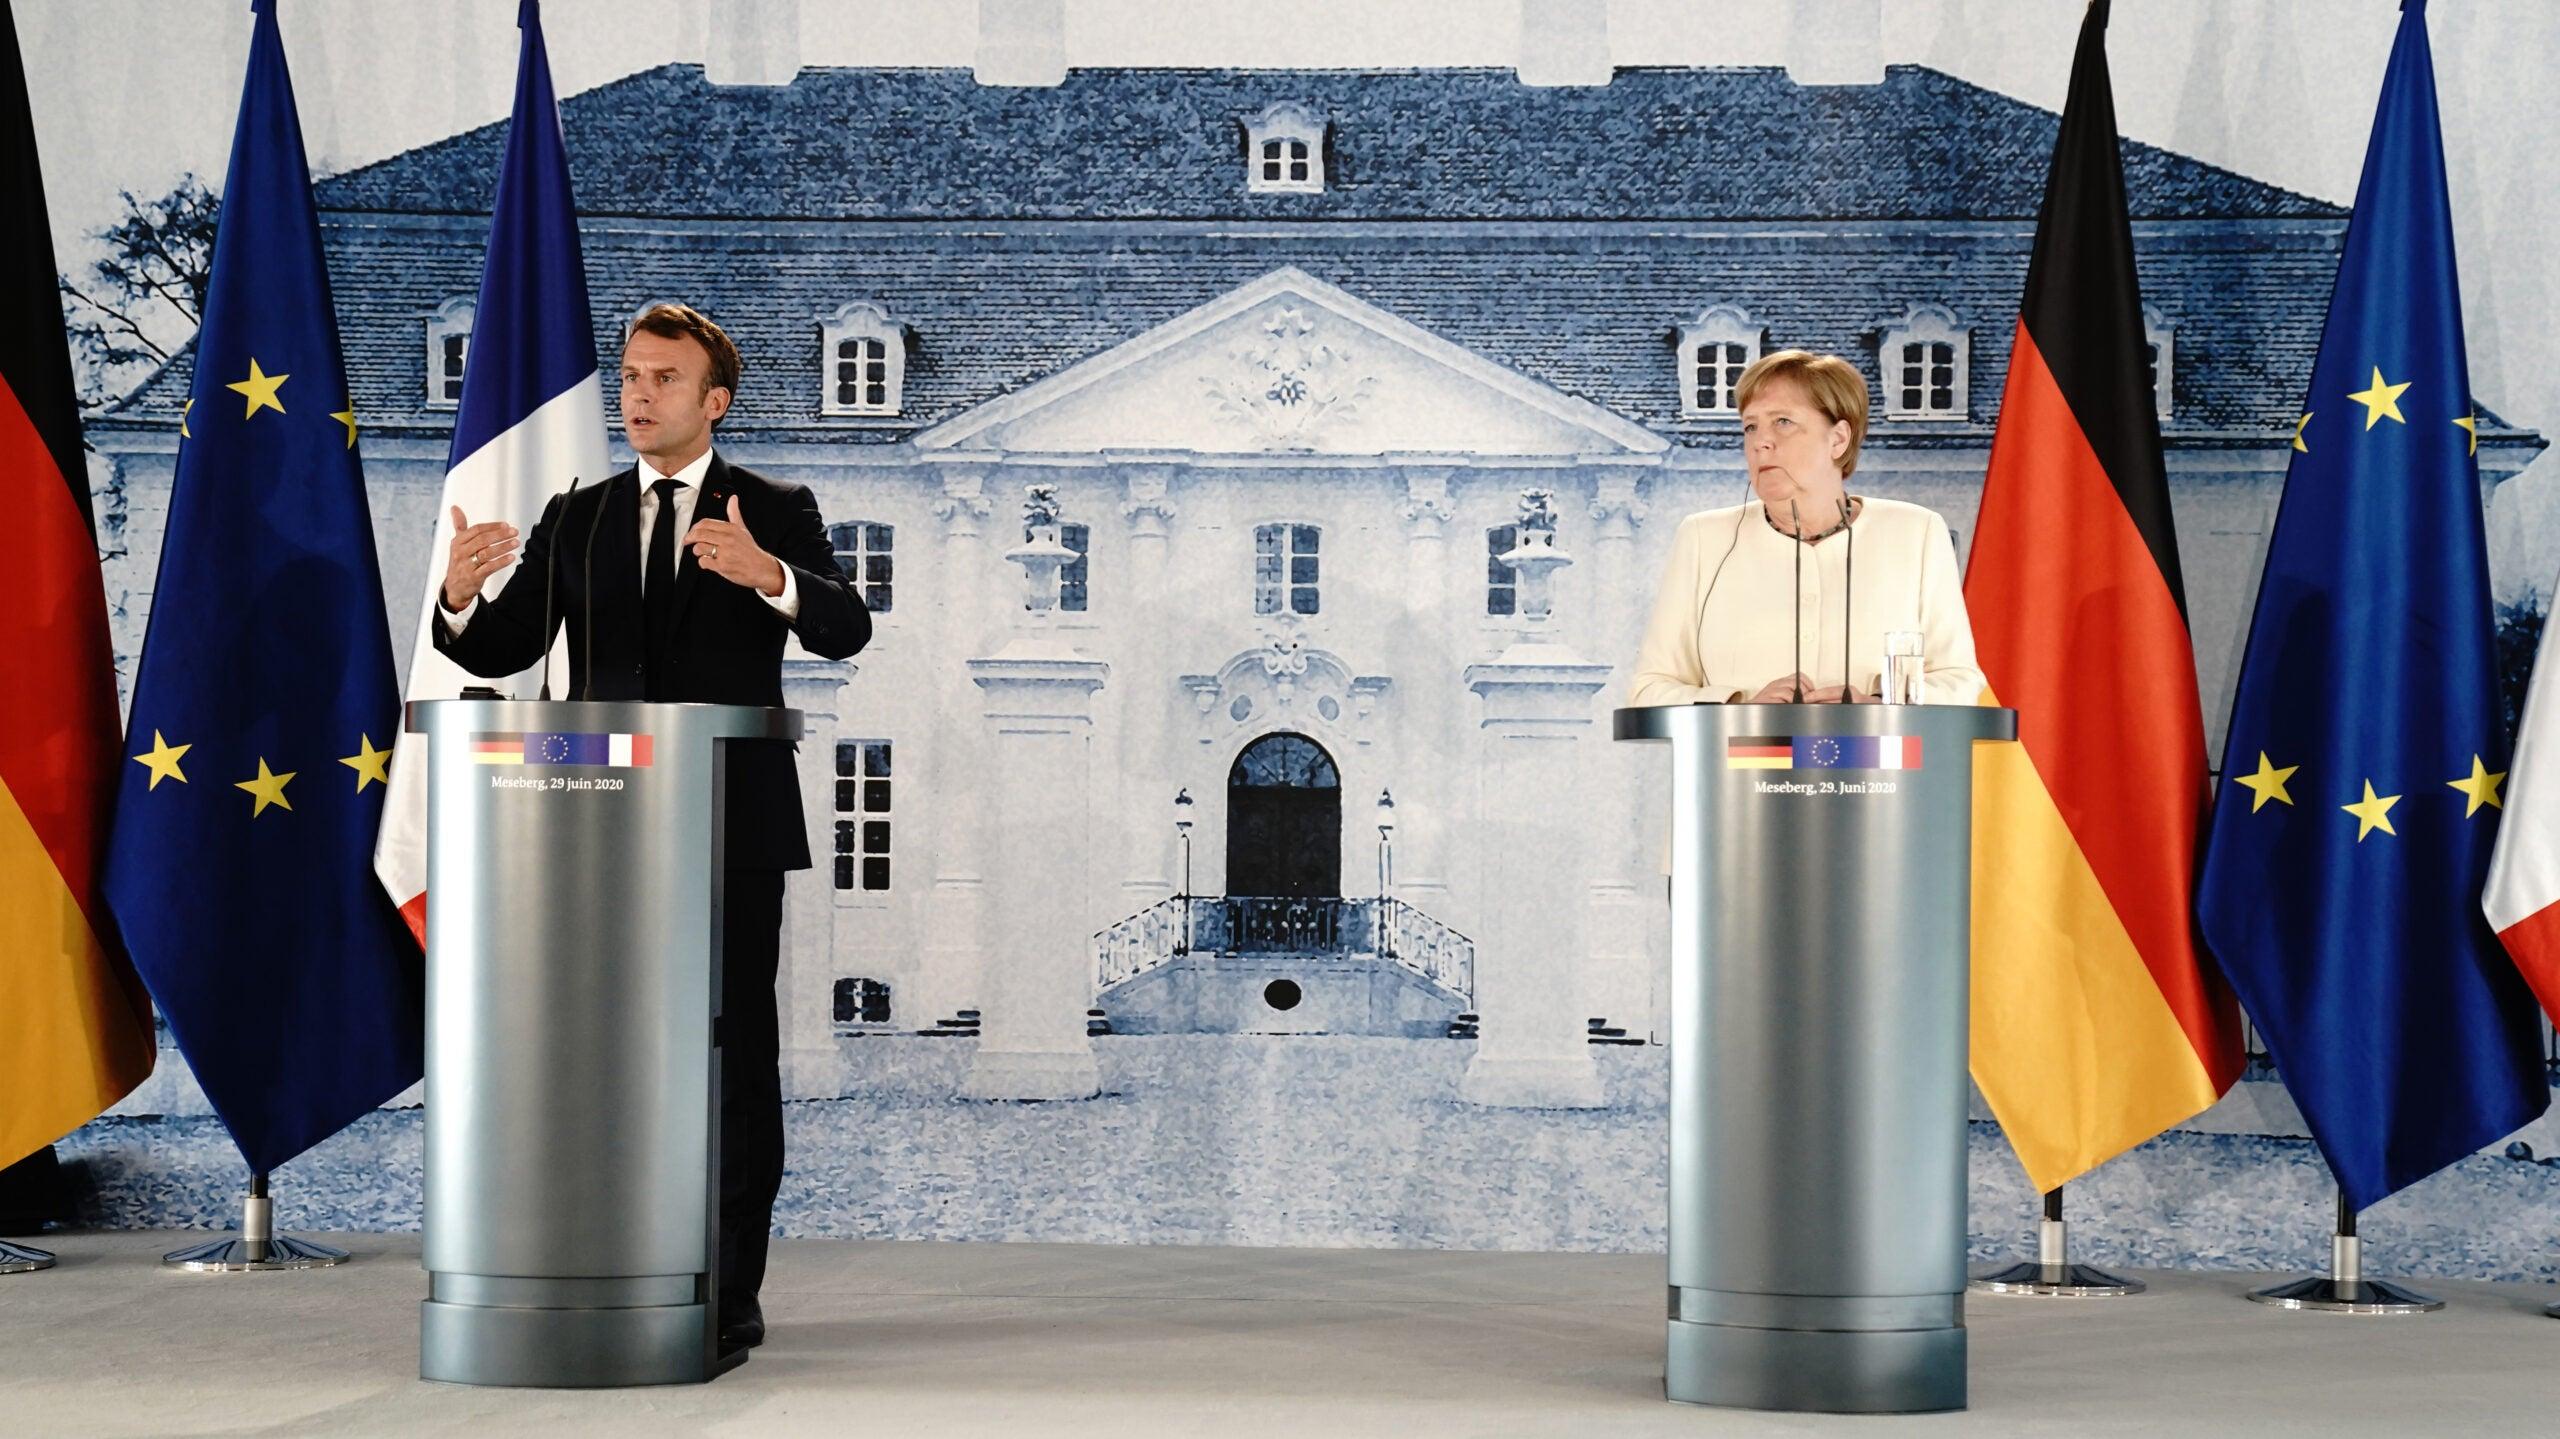 Podcast: Macron's Balancing Act